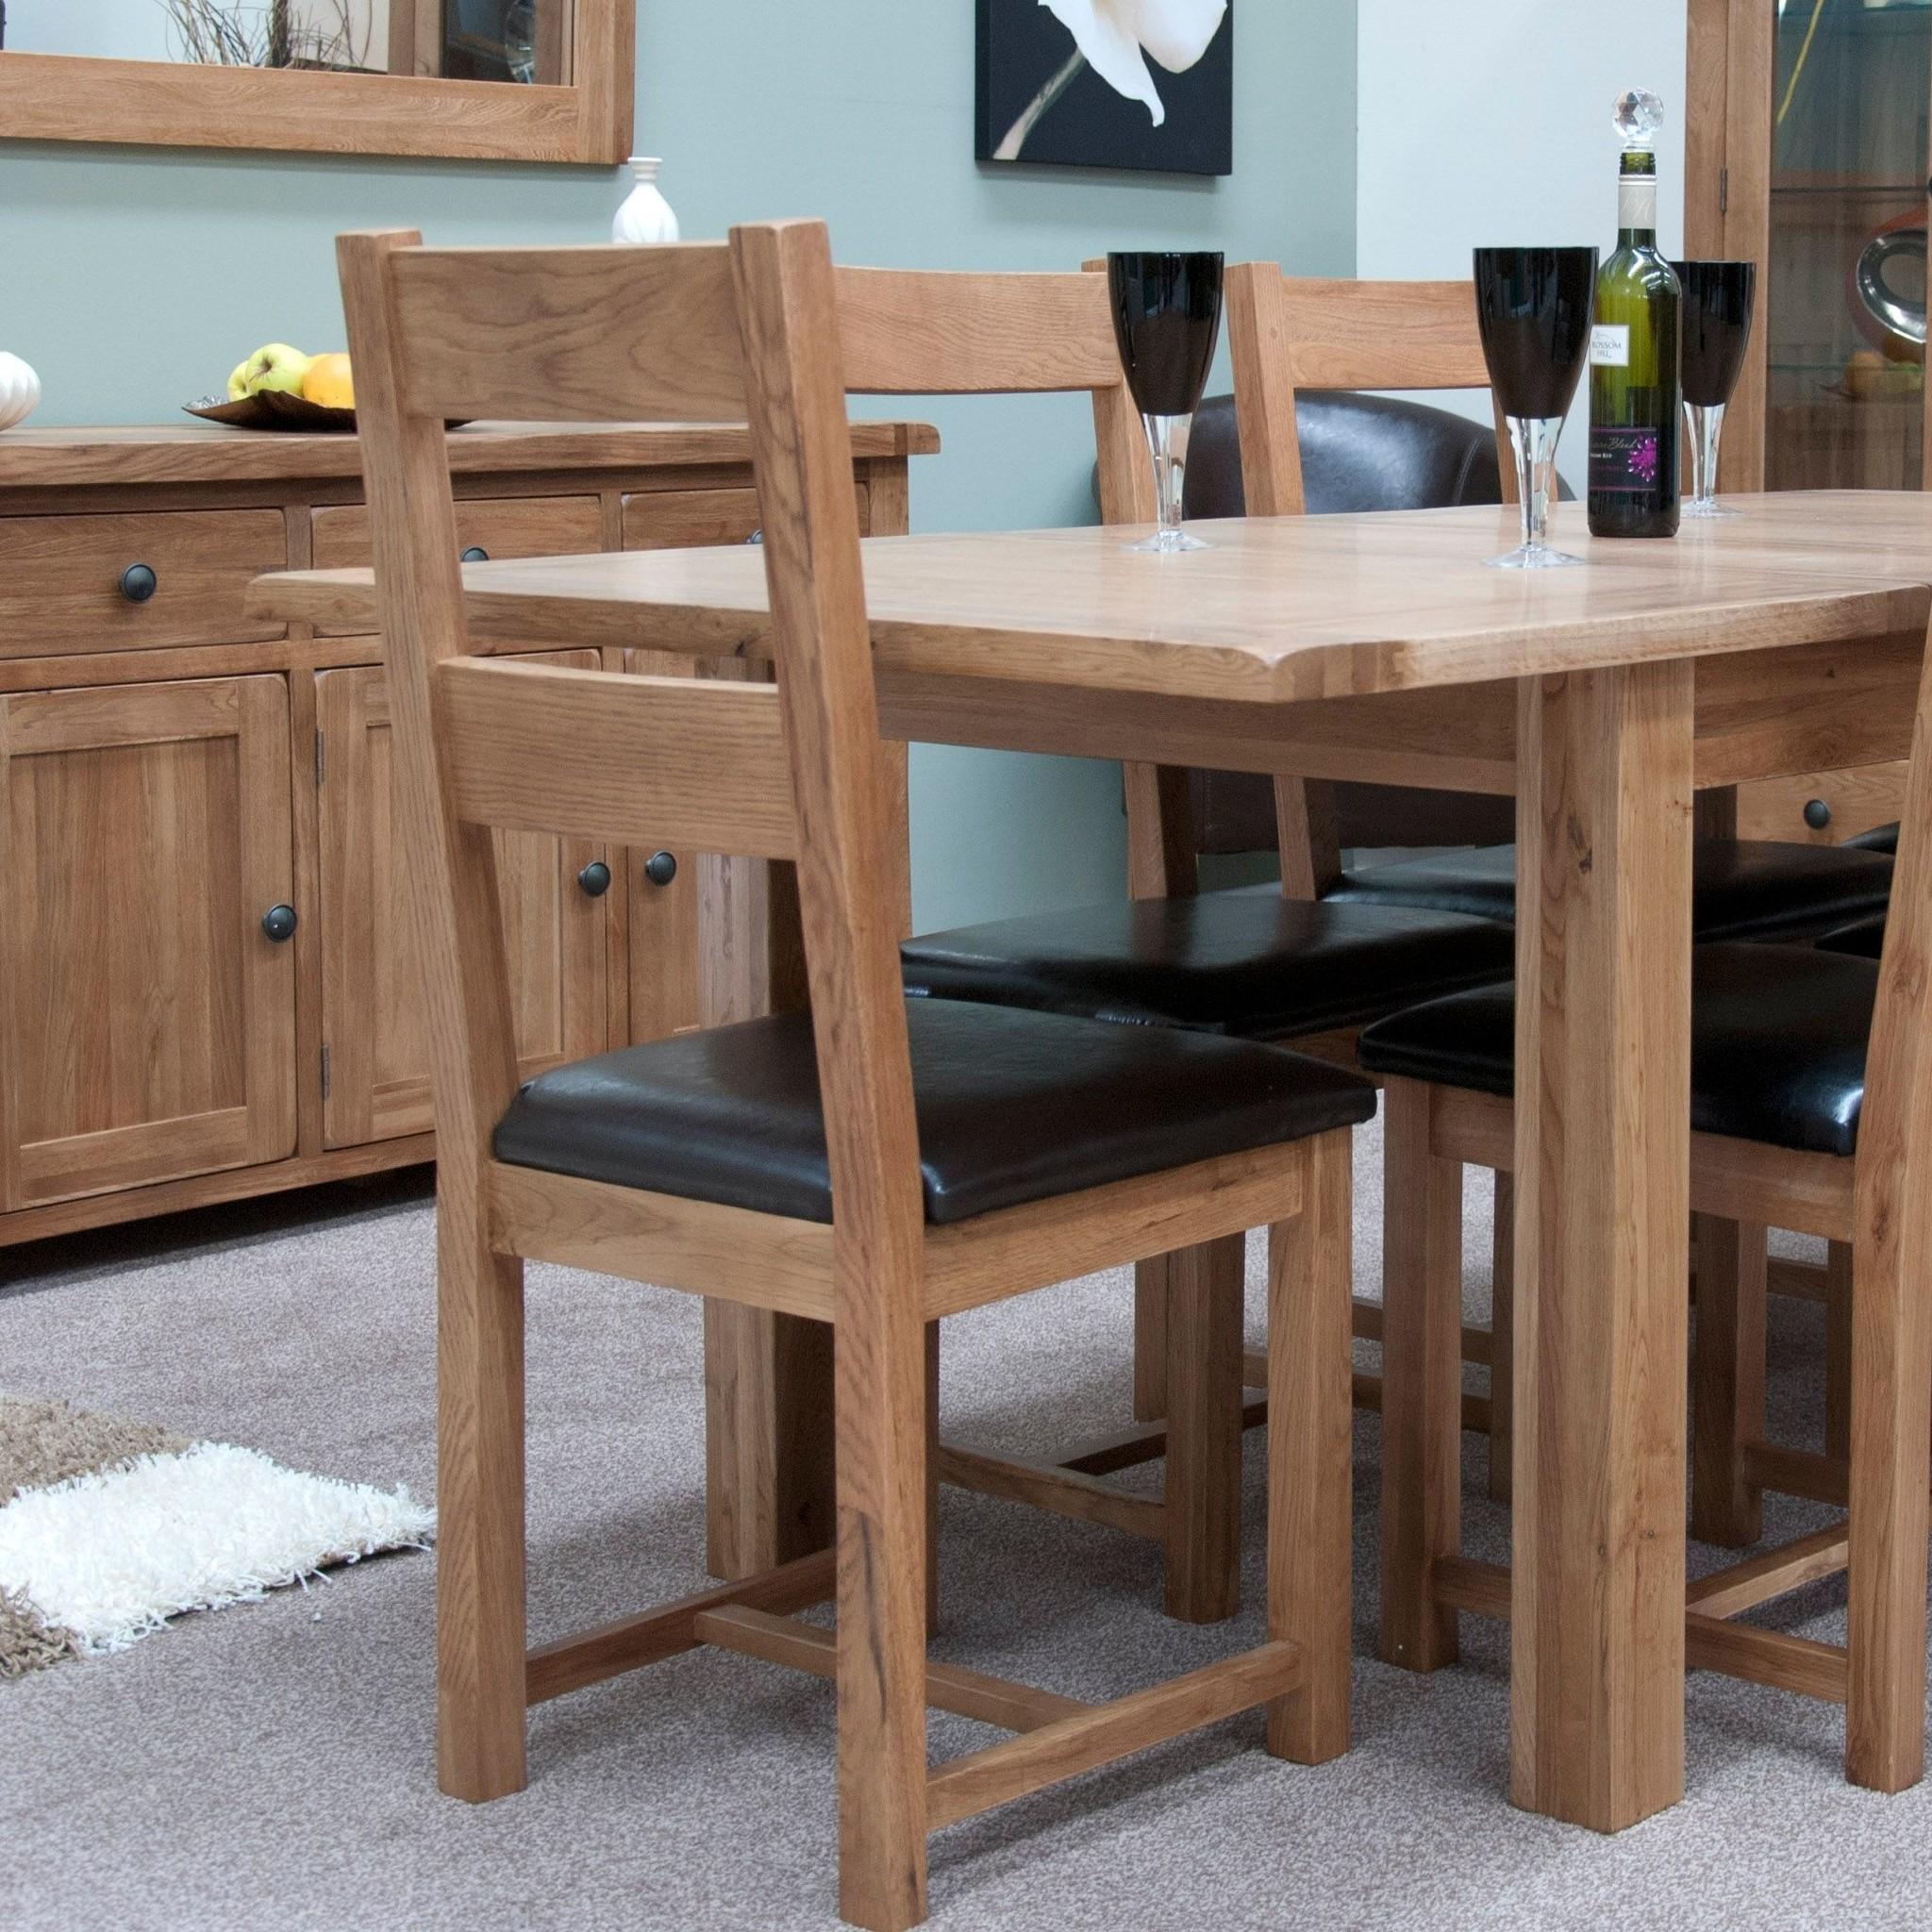 HomestyleGB Rustic Oak Dining Chair